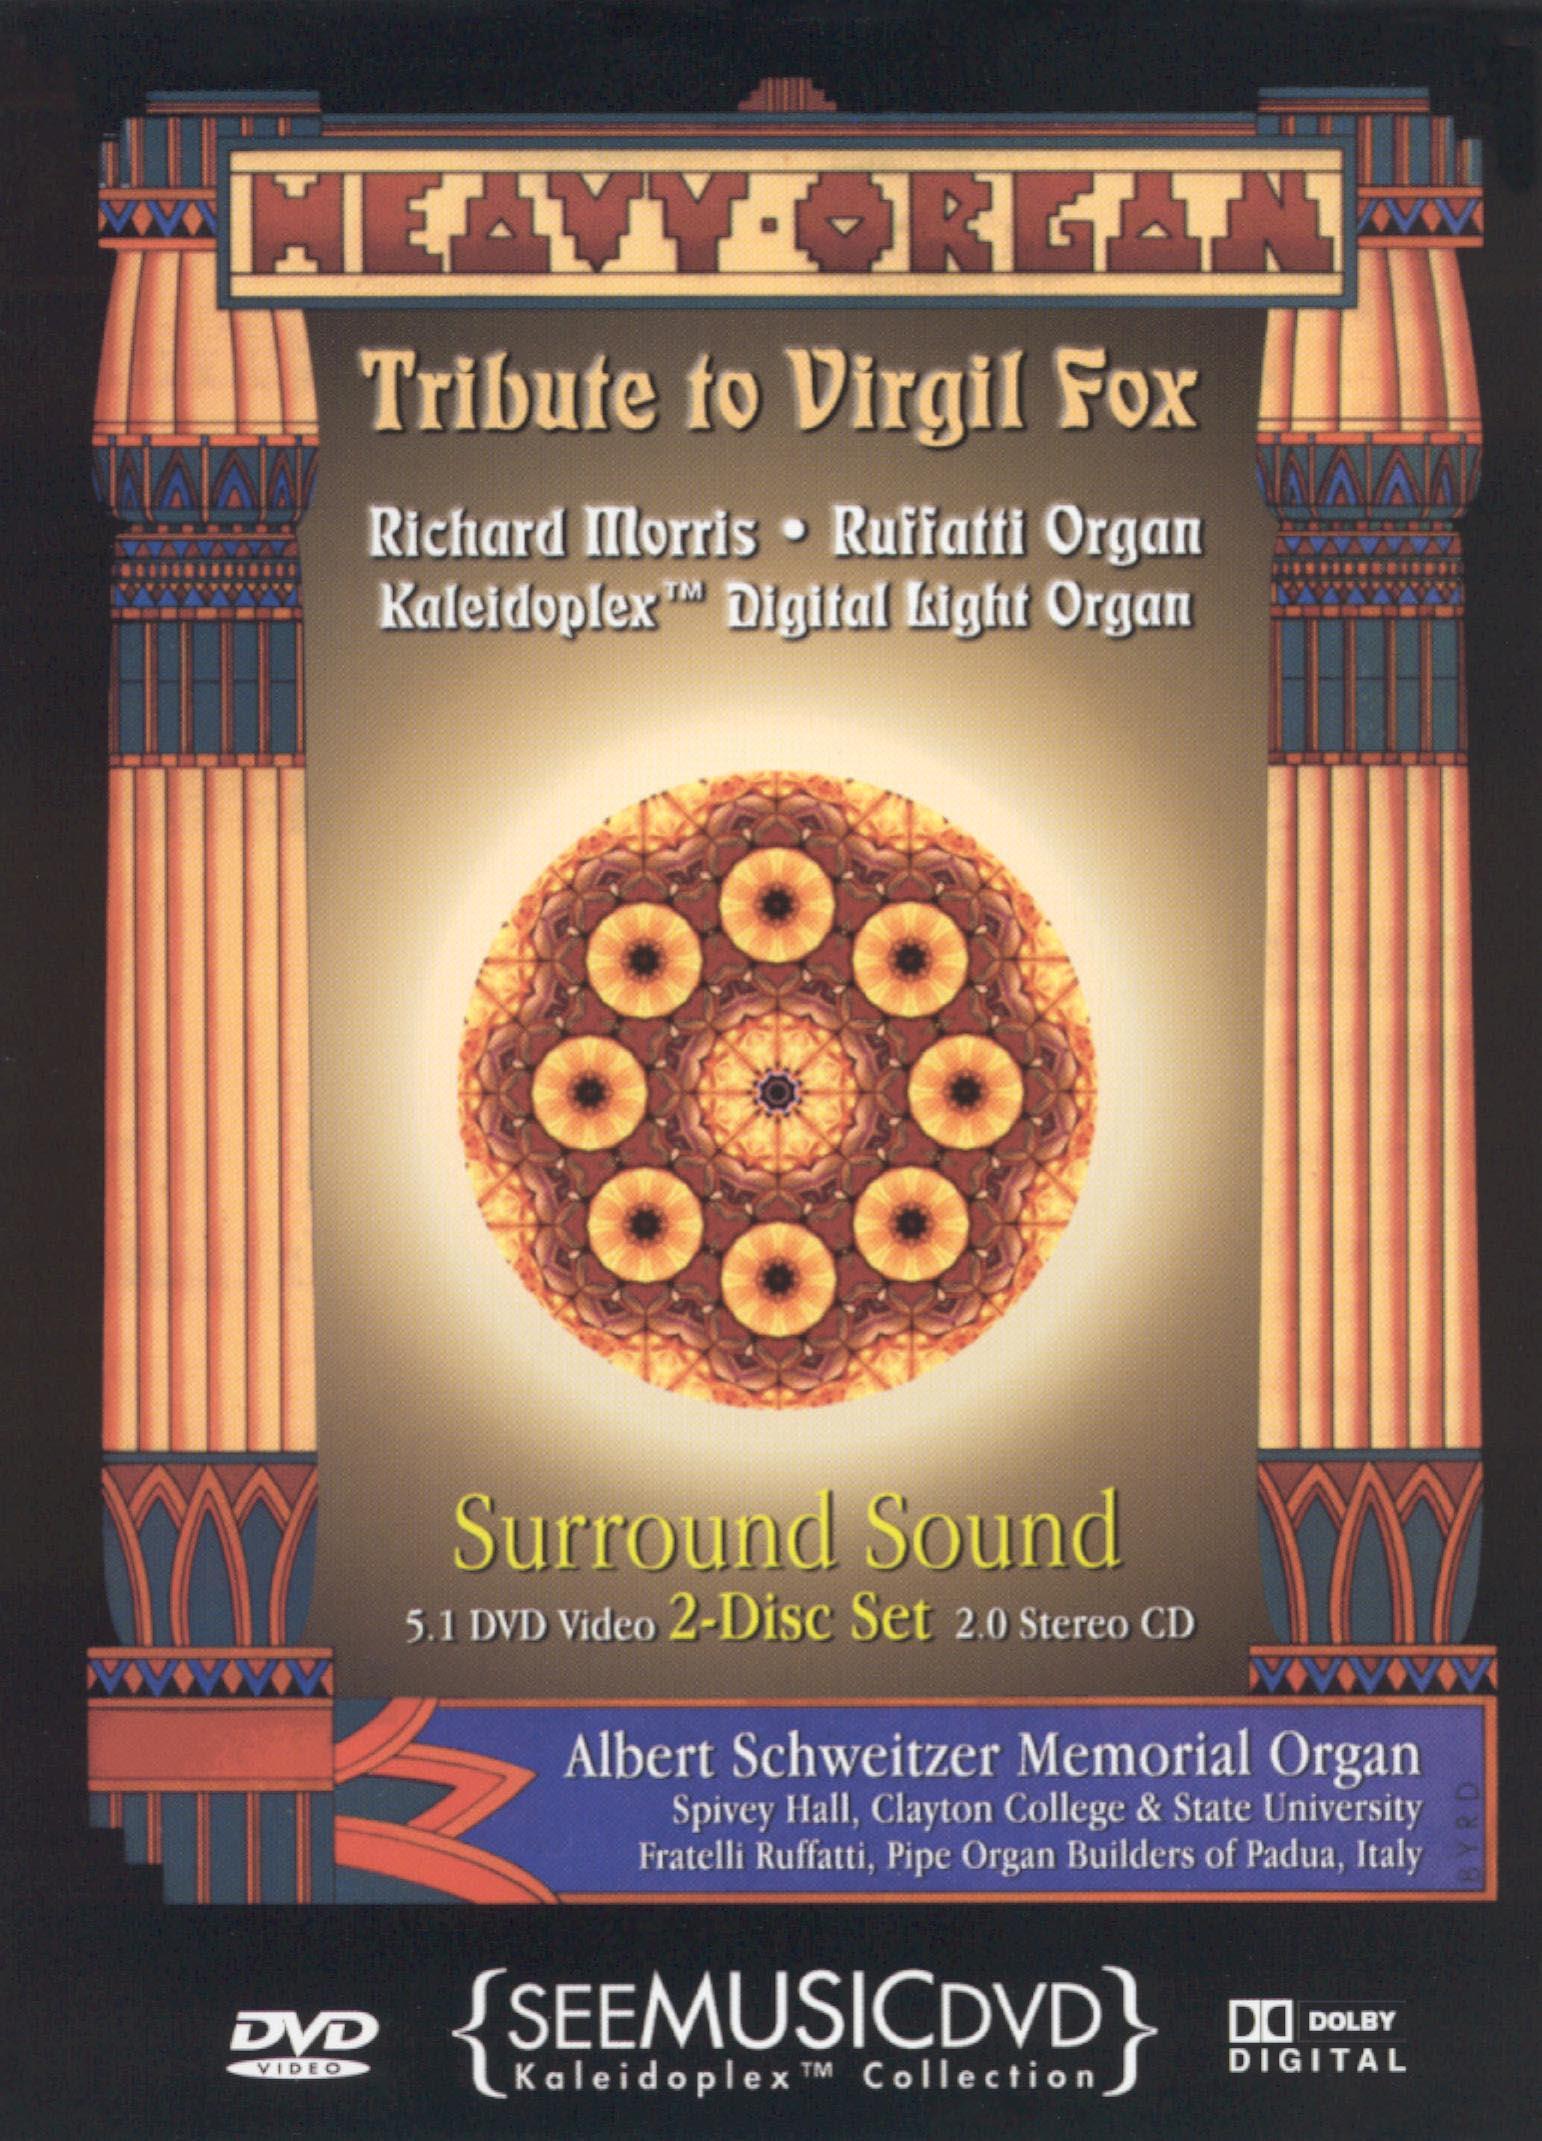 Heavy Organ: Tribute to Virgil Fox